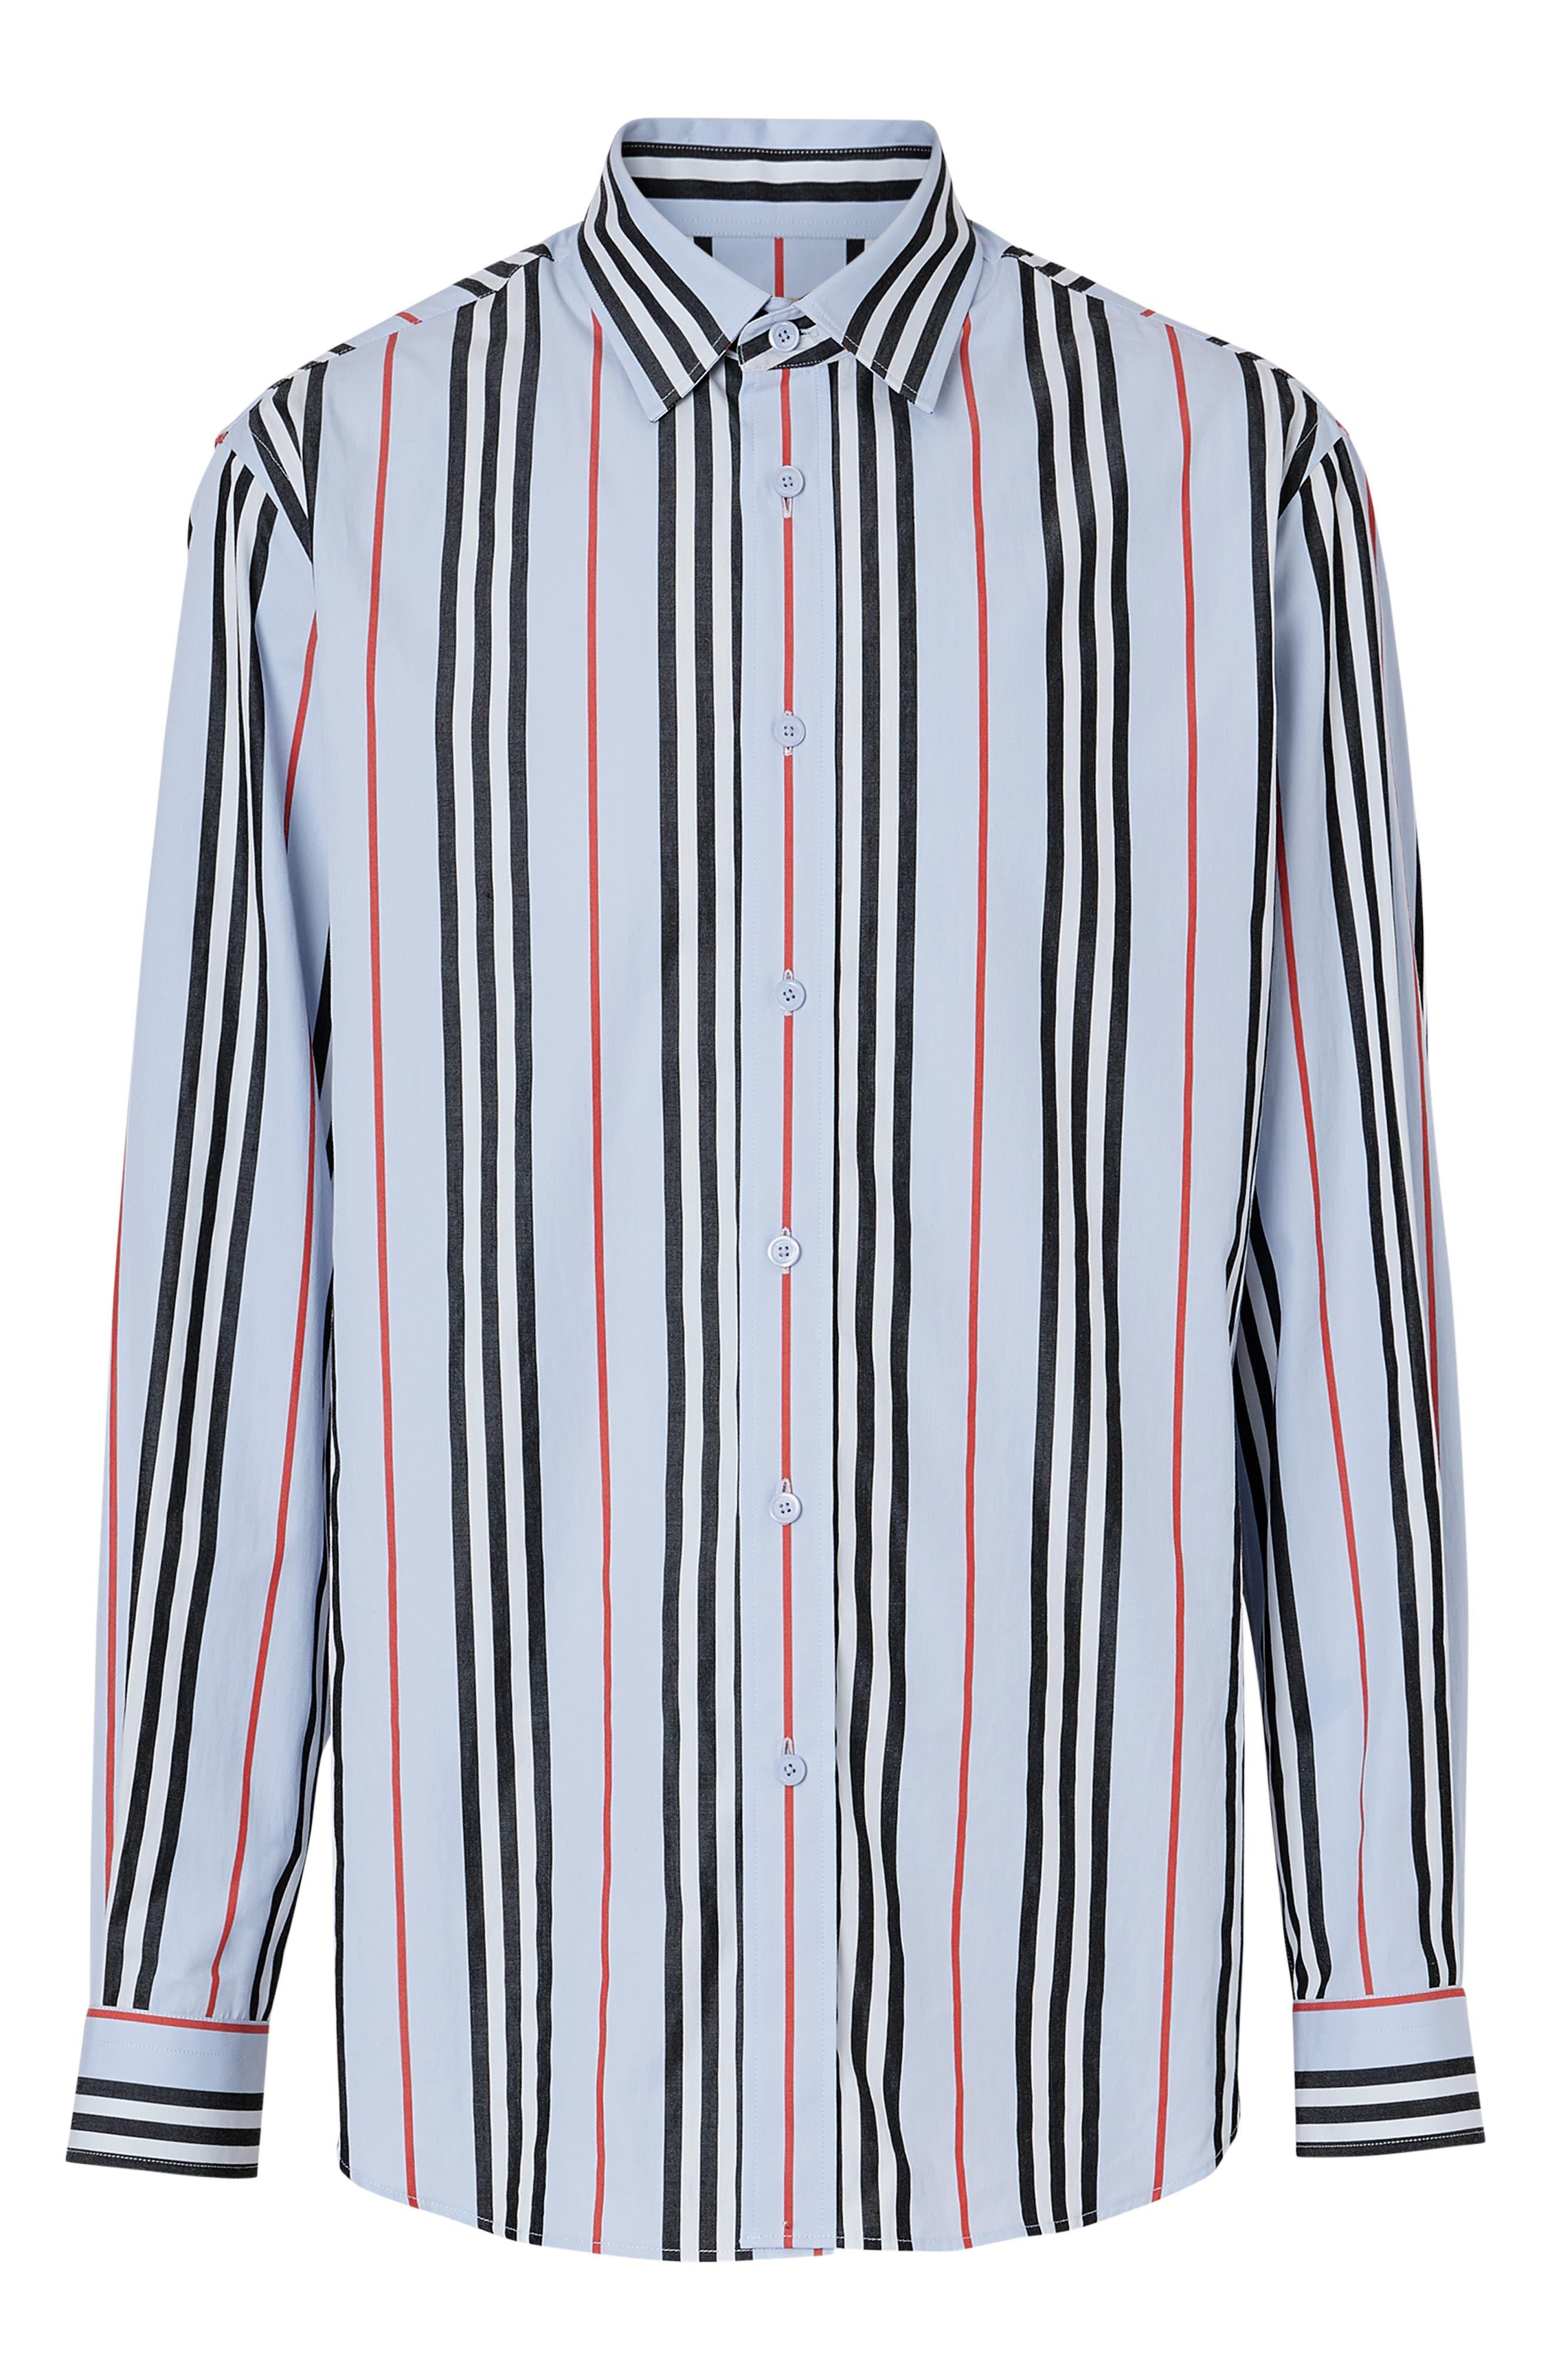 BURBERRY, Icon Stripe Shirt, Alternate thumbnail 5, color, PALE BLUE